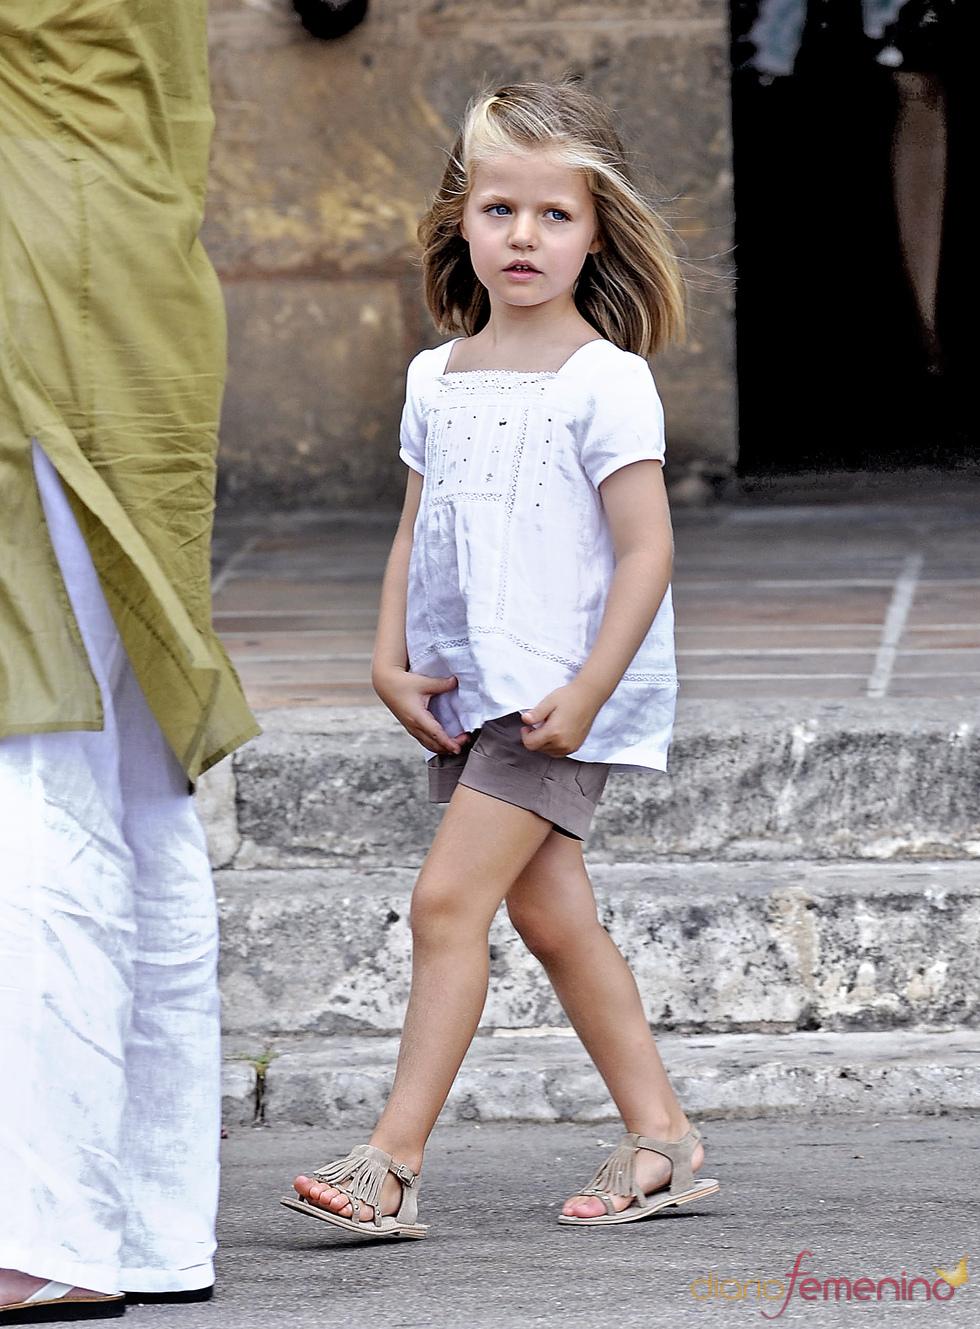 La infanta Leonor pasea coqueta en Mallorca